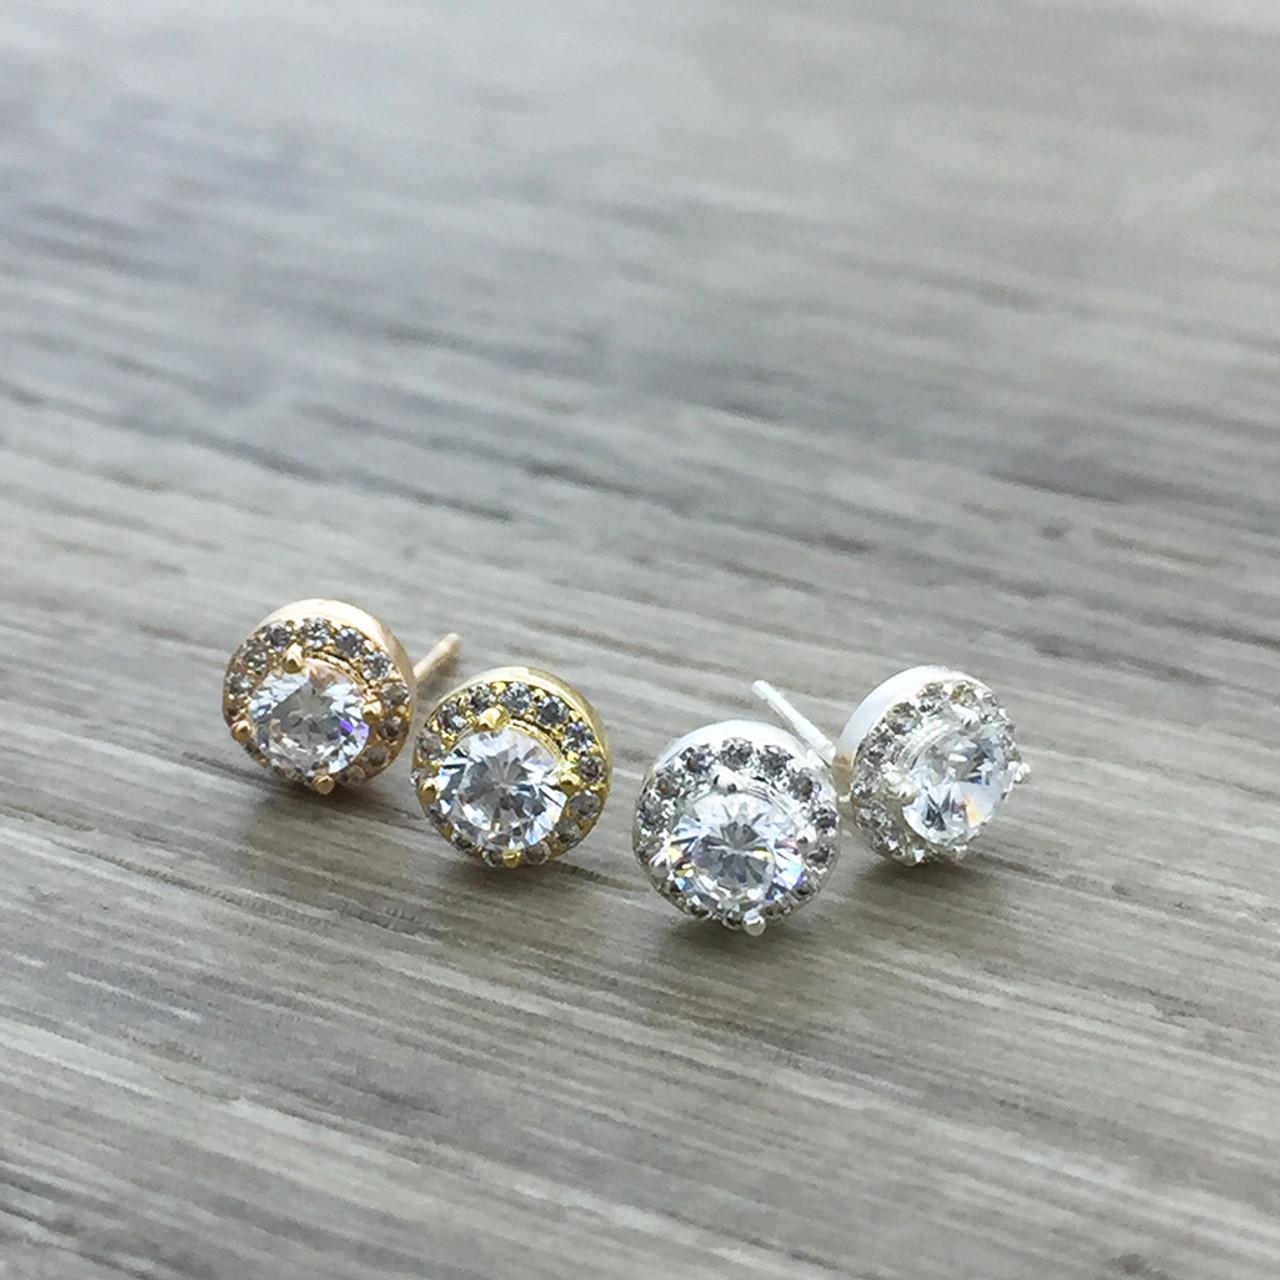 e1ec7a81ef1e Luxe circle stud earring - FAB Accessories Inc.